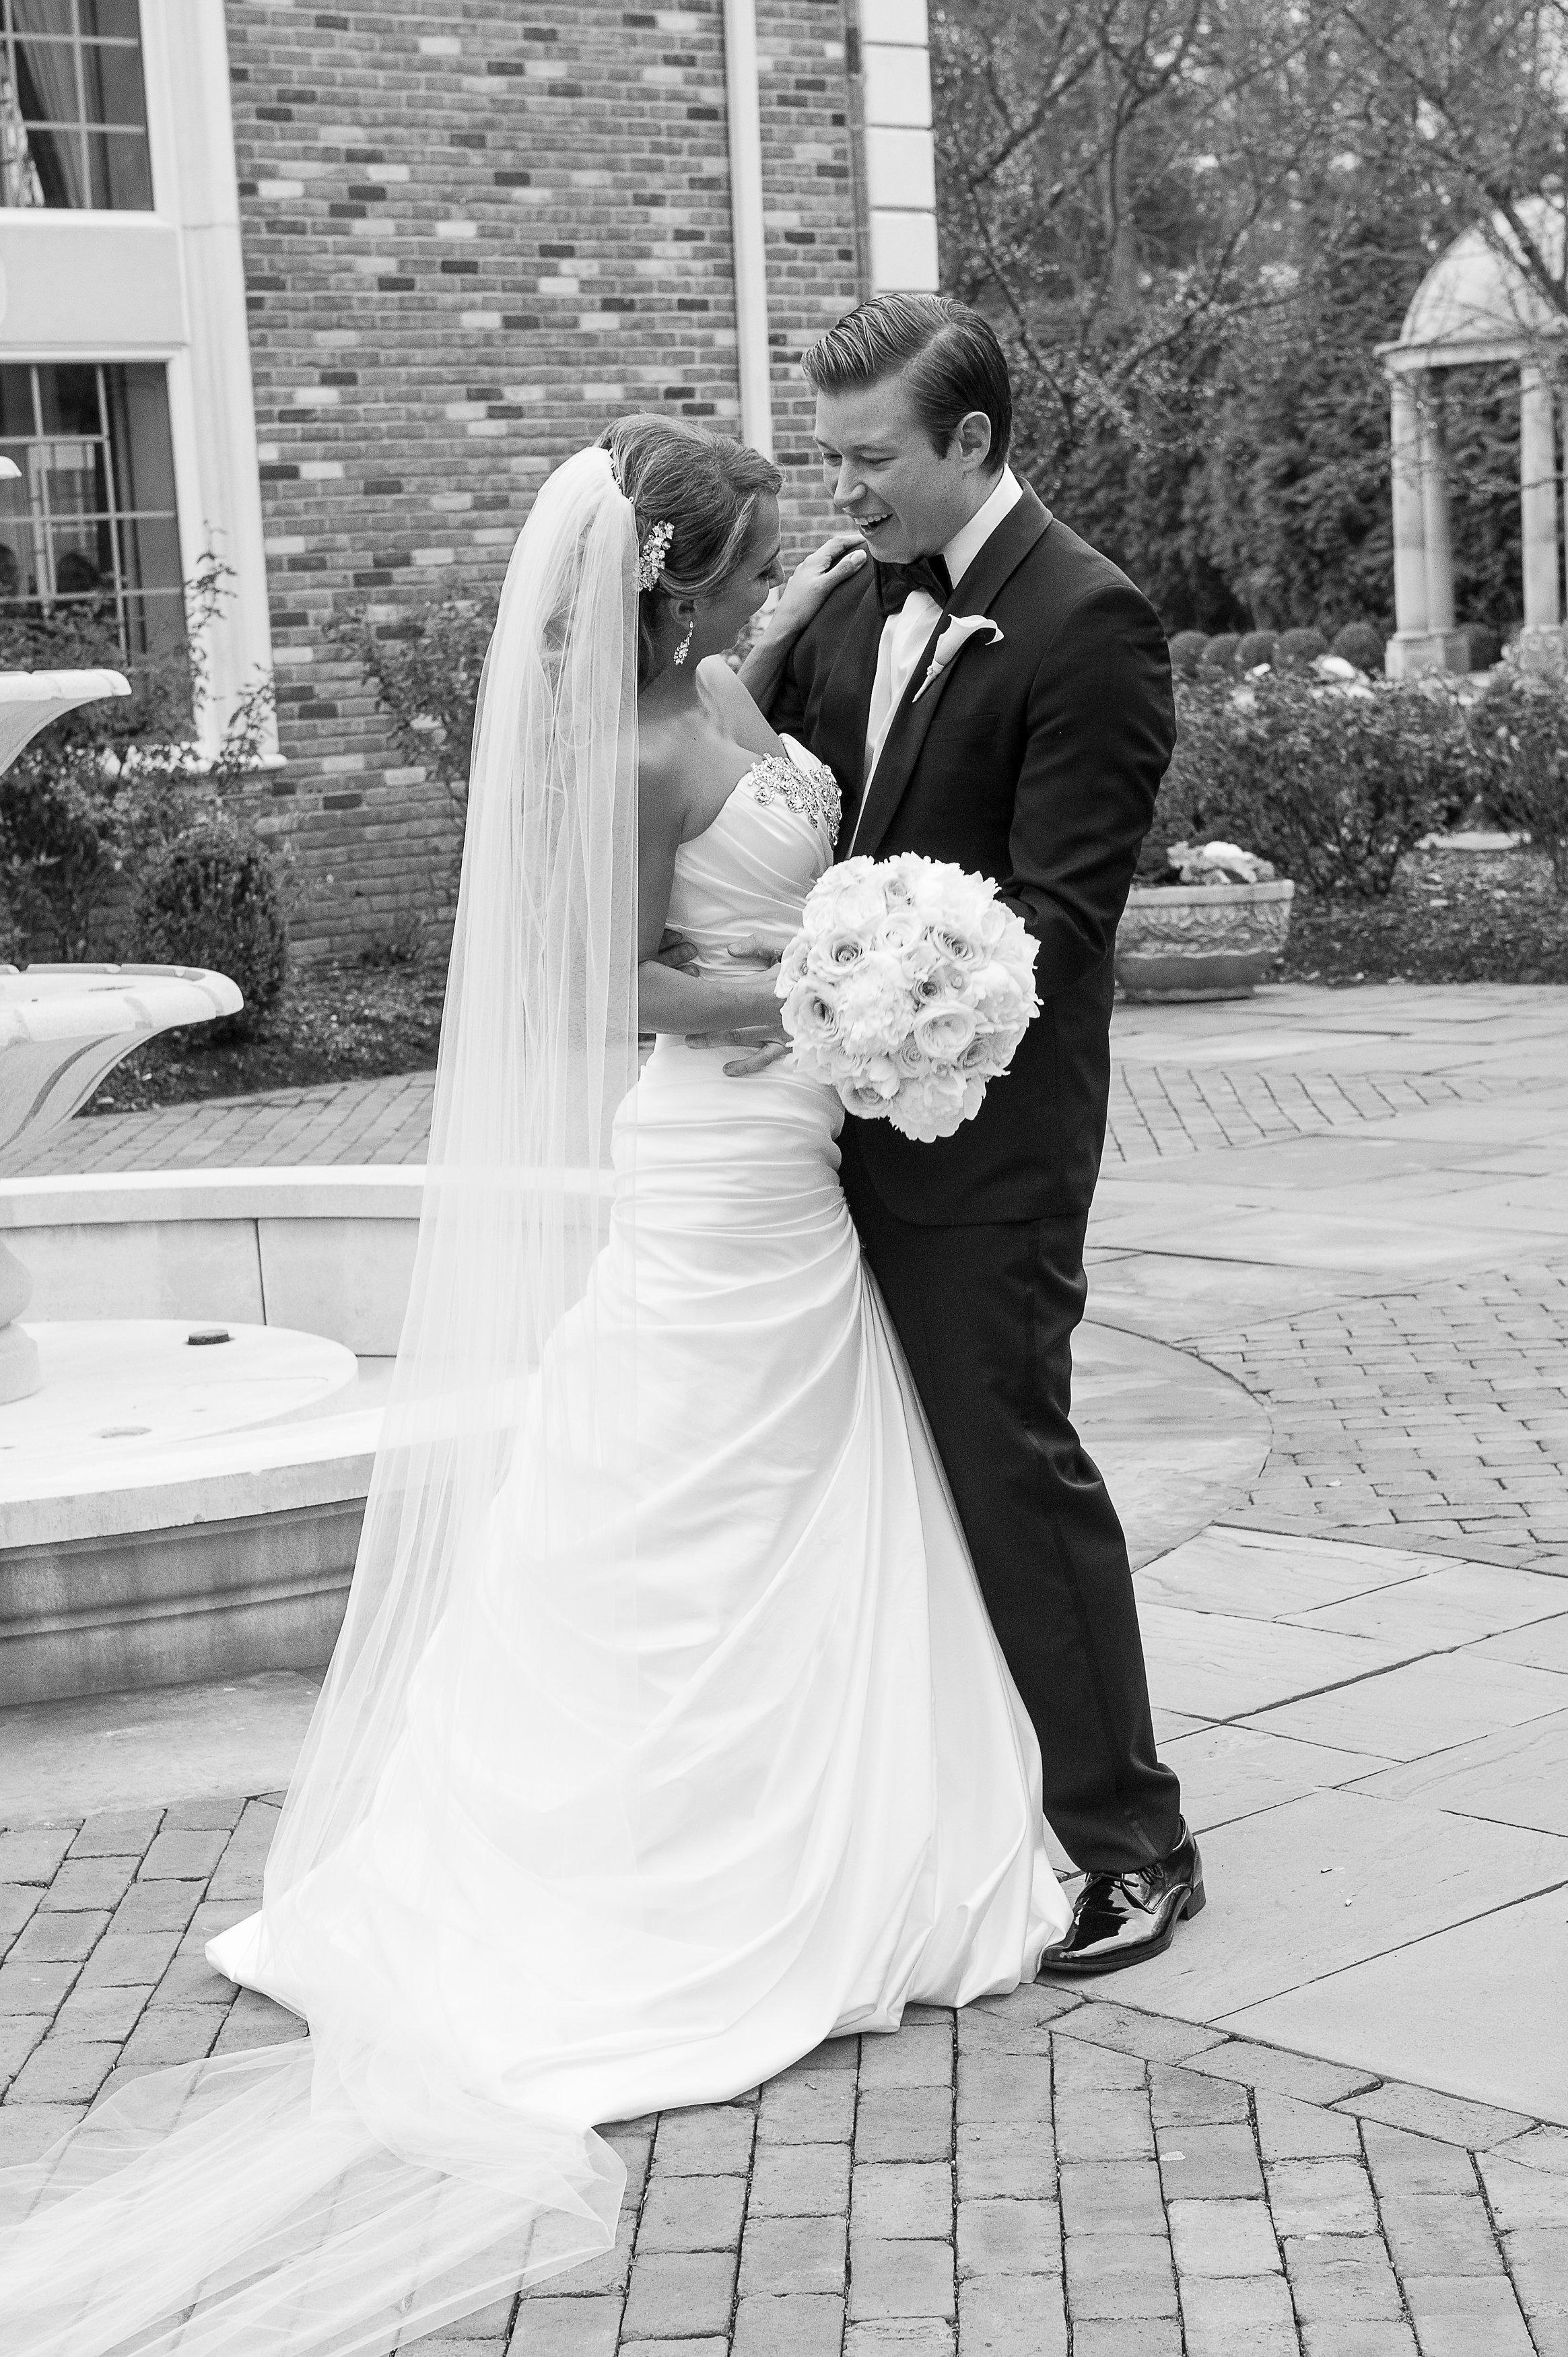 Ceci_New_York_Custom_Invitation_ New_Jersey_Wedding_Luxury_Personalized_Ceci_Style_Bride_Foil_Stamping93.JPG